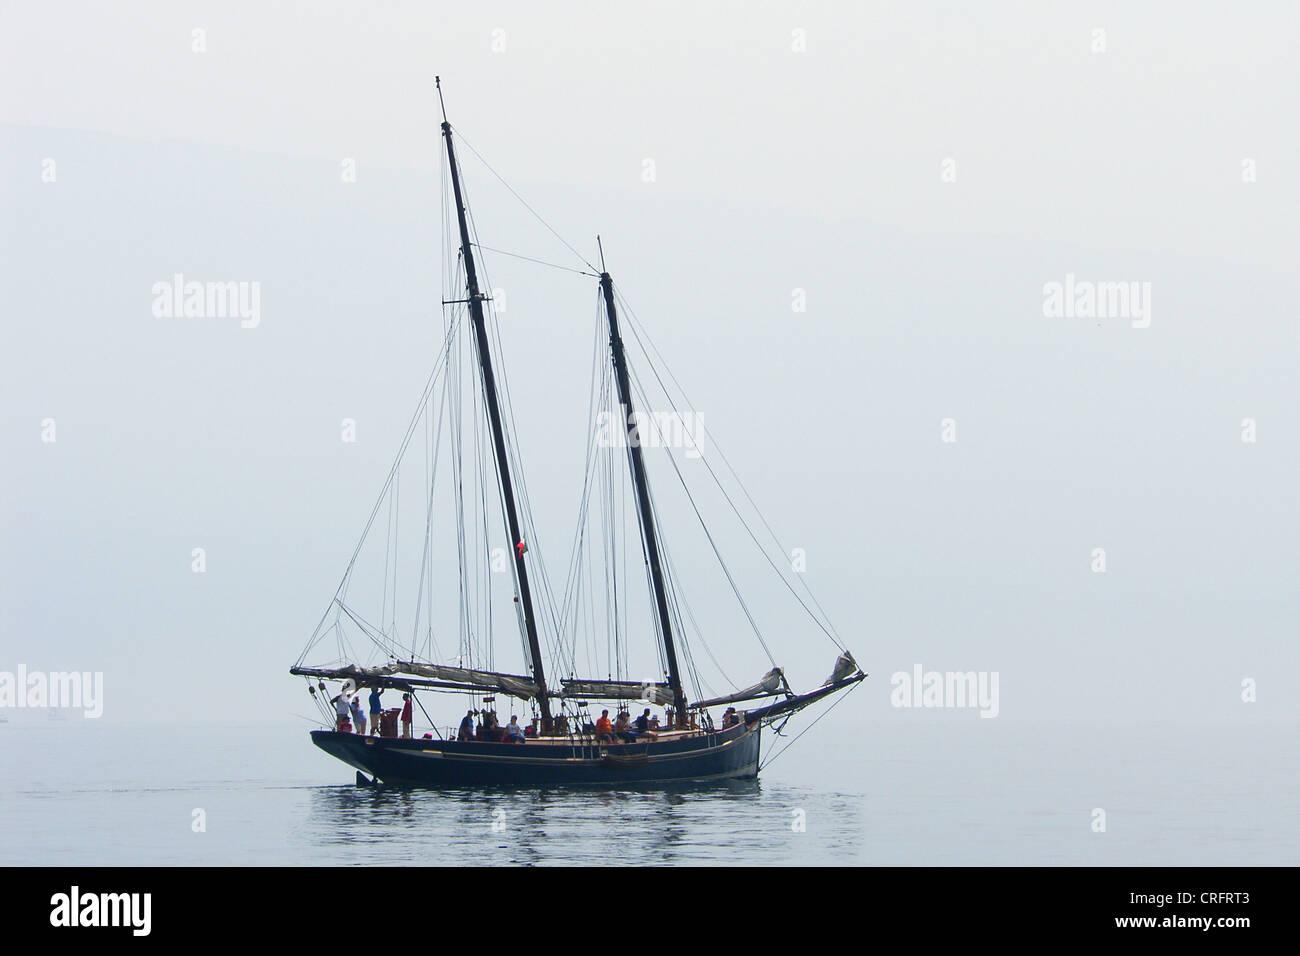 sailing boat - Stock Image